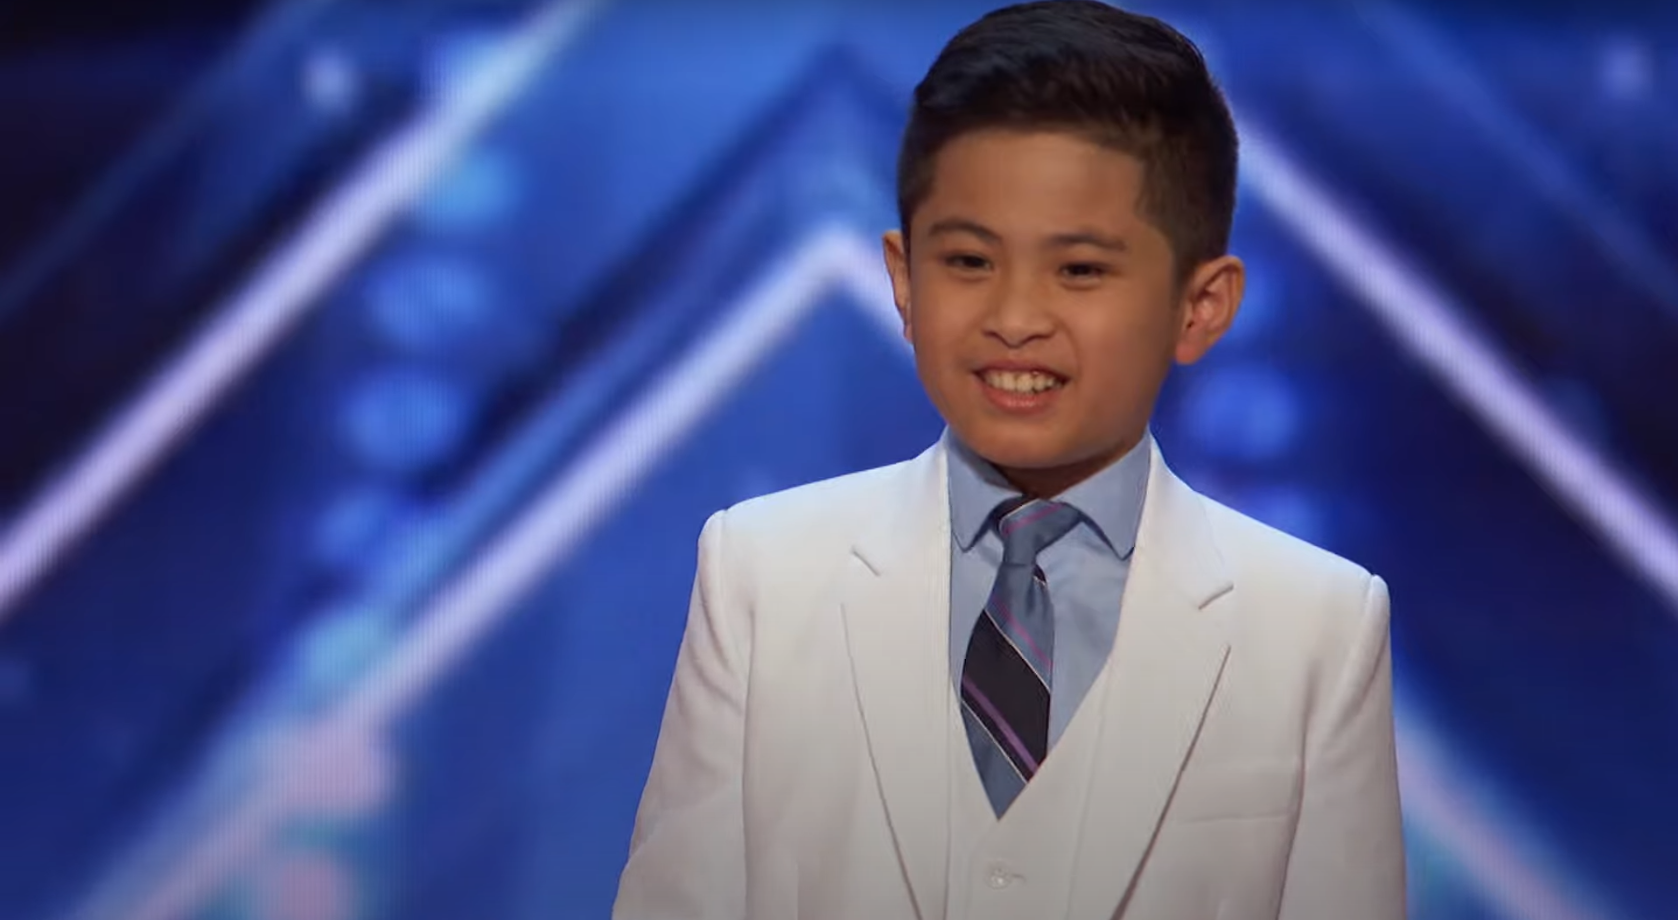 """filipino-singer-peter-rosalita-wraps-up-his-journey-on-americas-got-talent"""